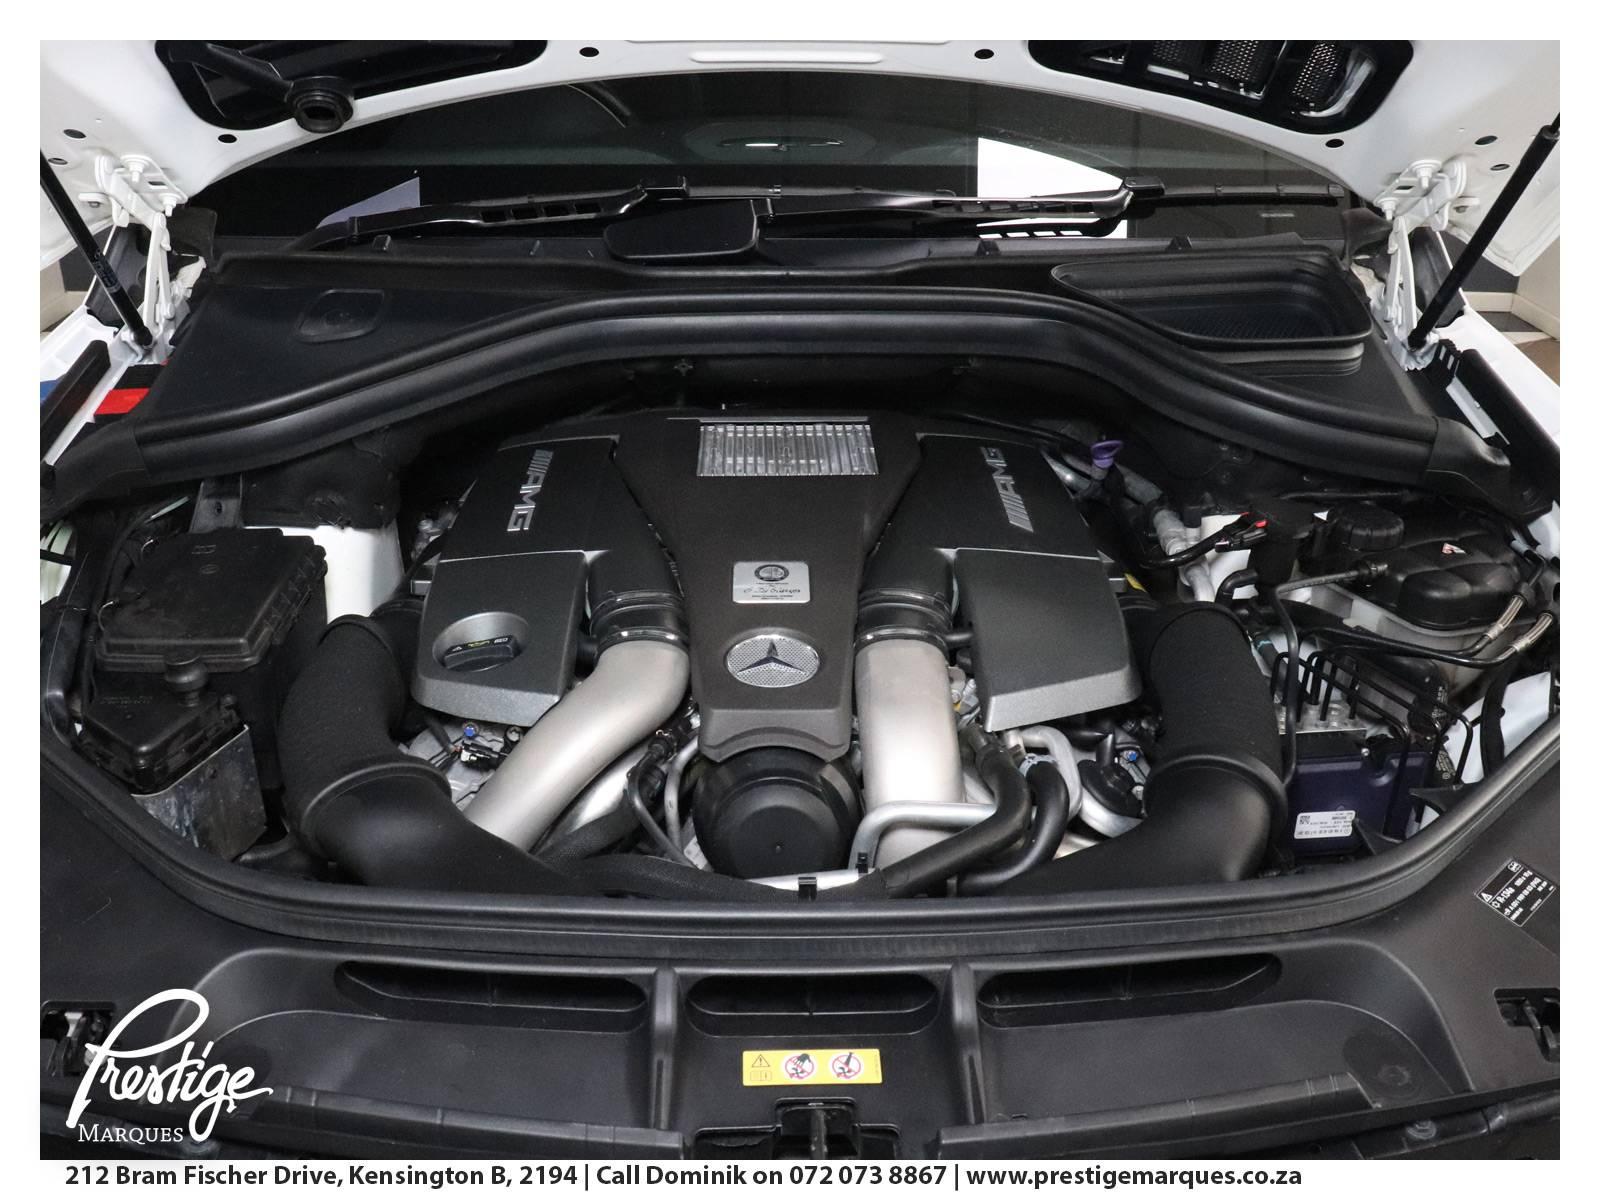 2015-Mercedes-Benz-ML63-AMG-Prestige-Marques-Randburg-Sandton-8